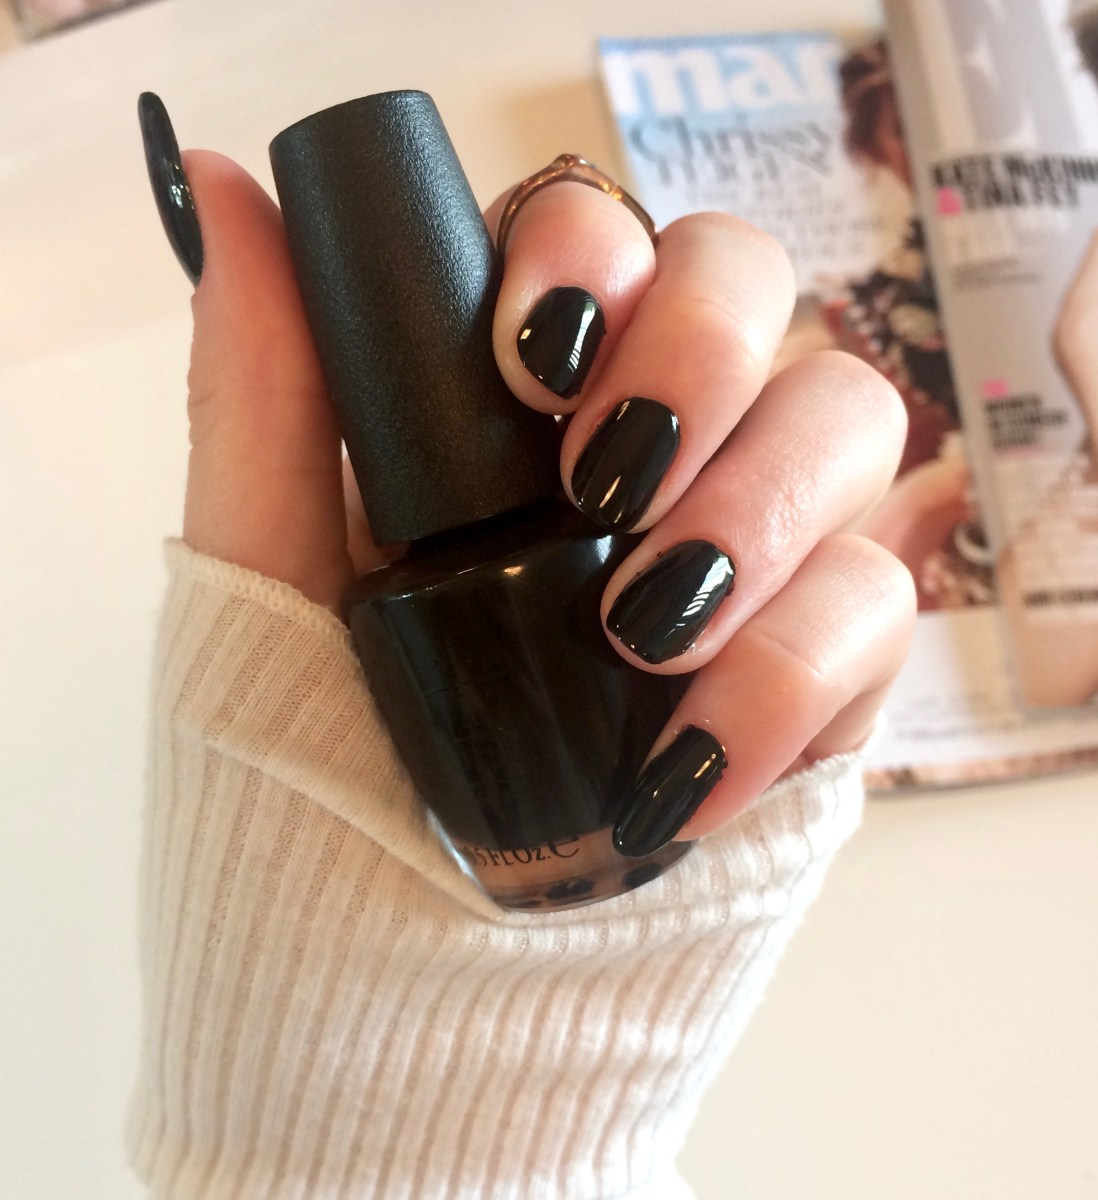 classy black nails taylor dorothy